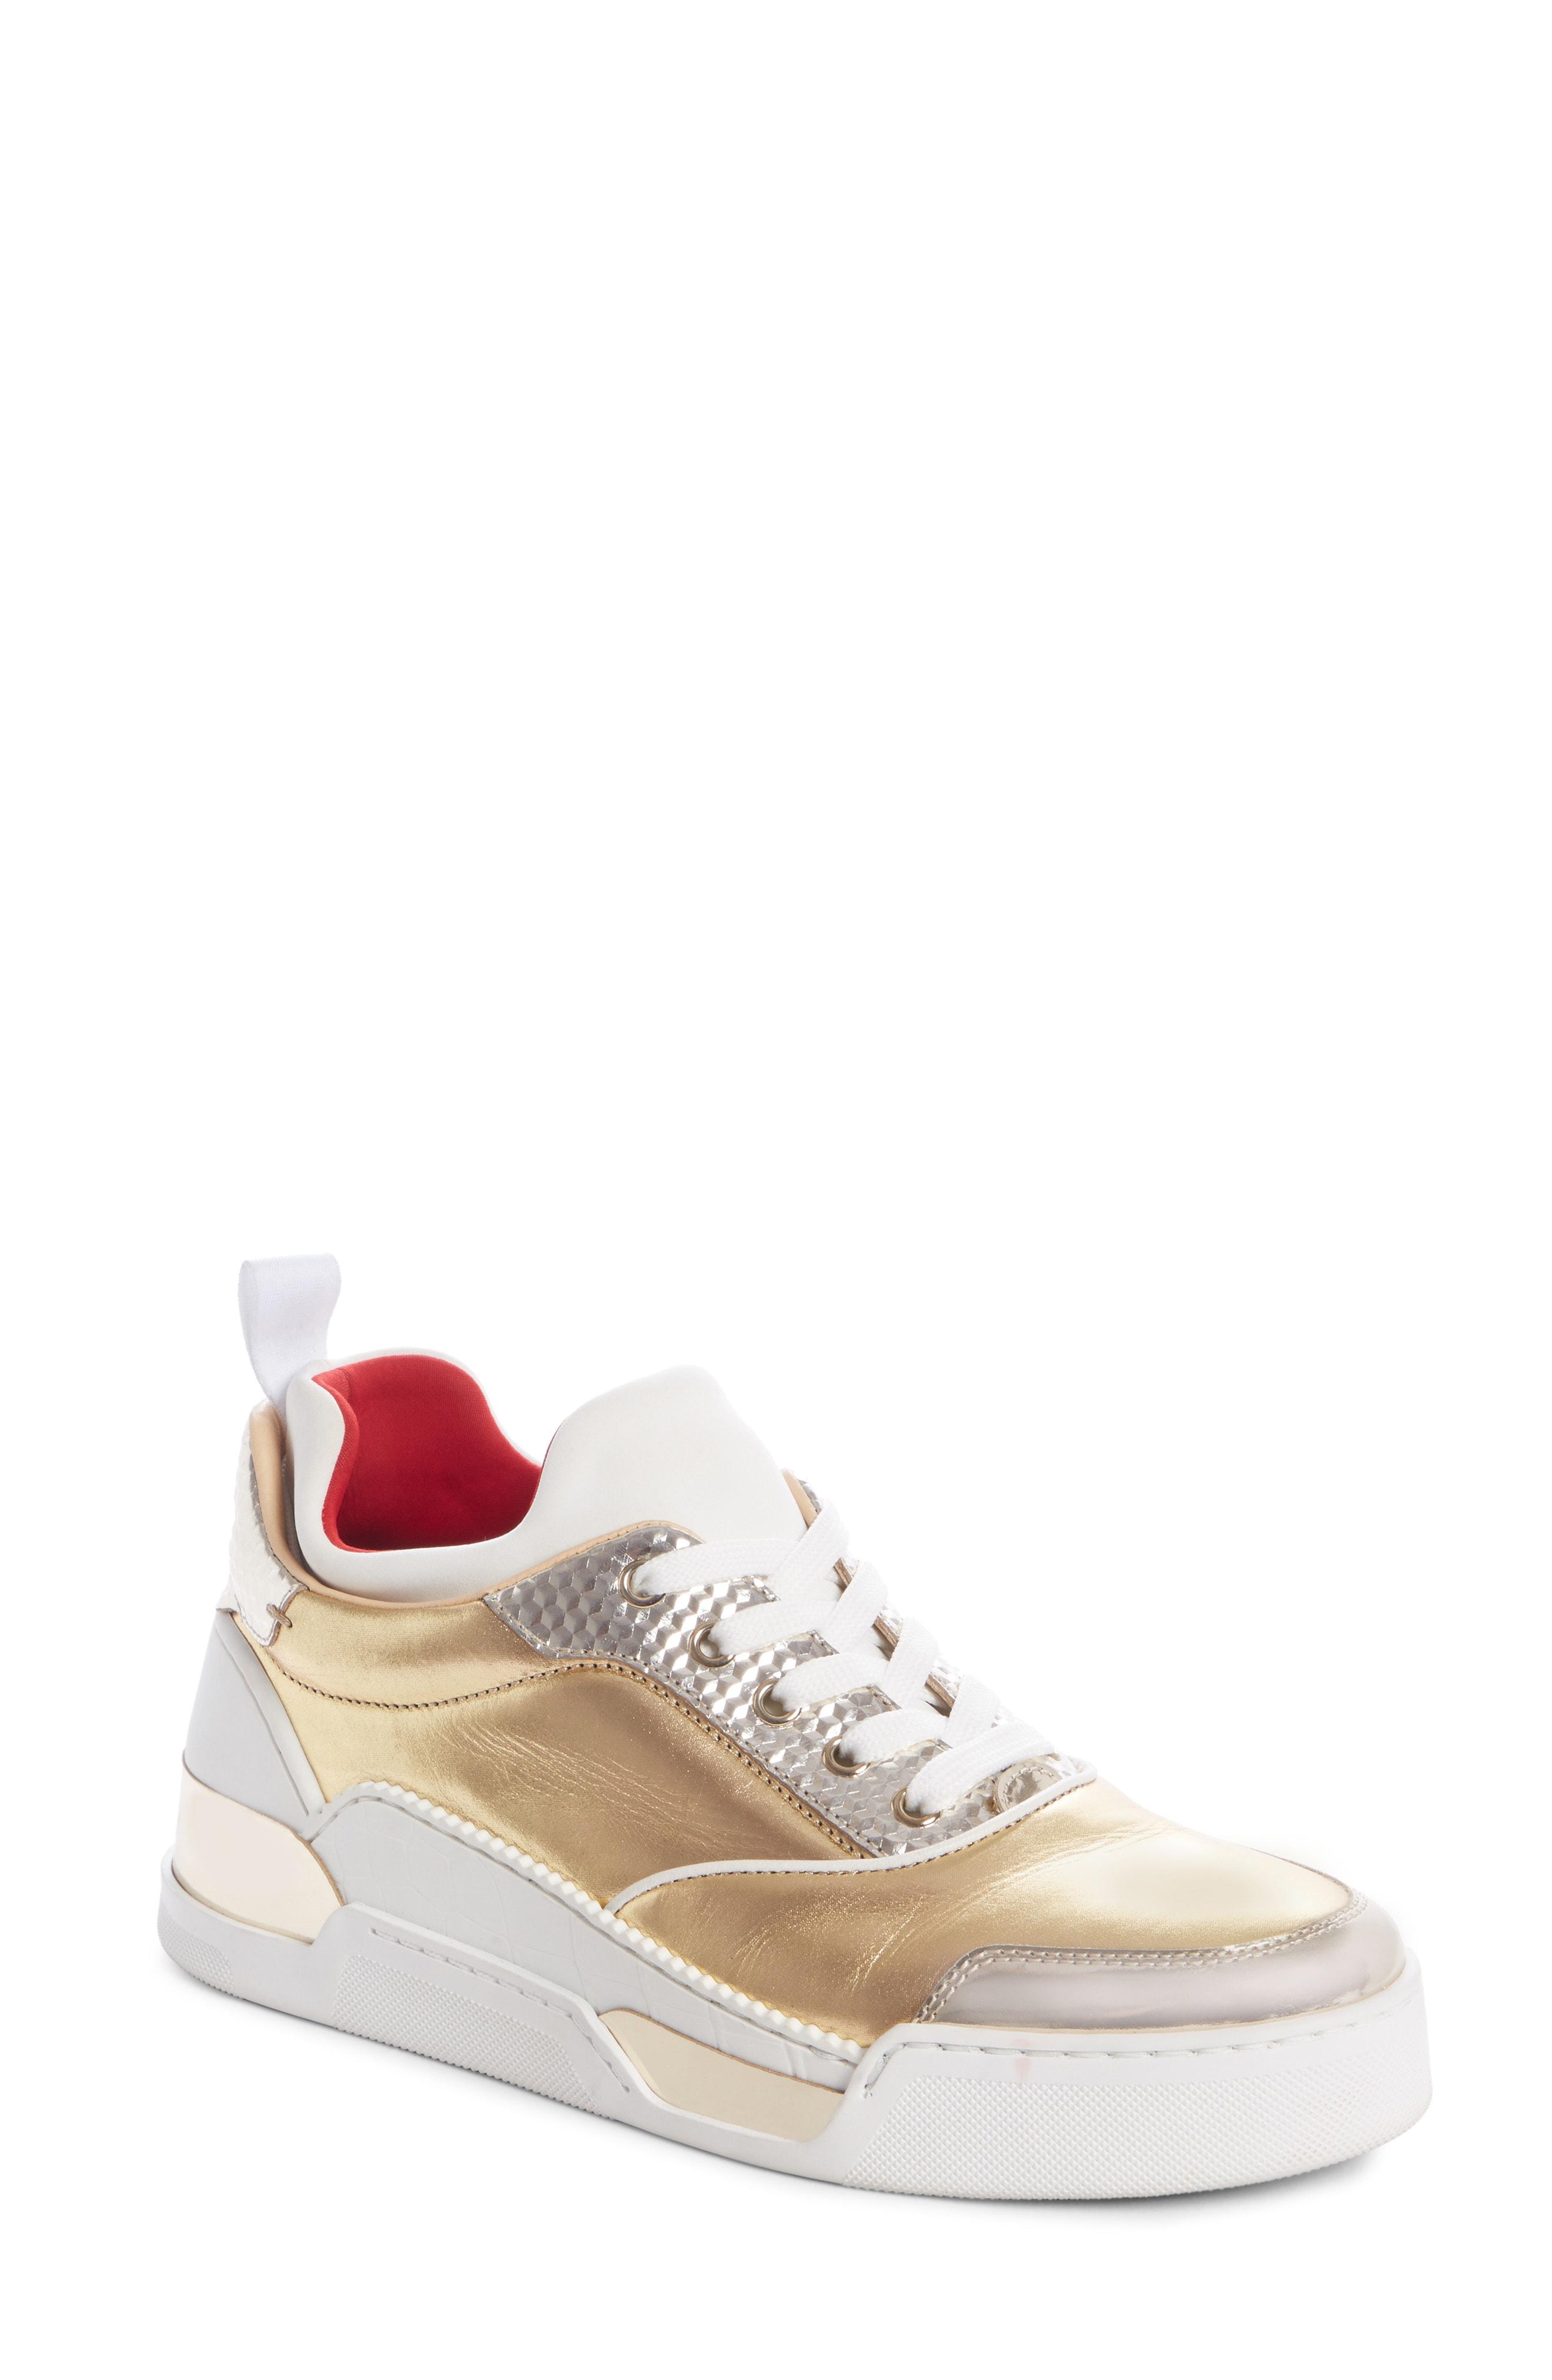 Christian Louboutin Aurelien Donna Sneaker (Women)